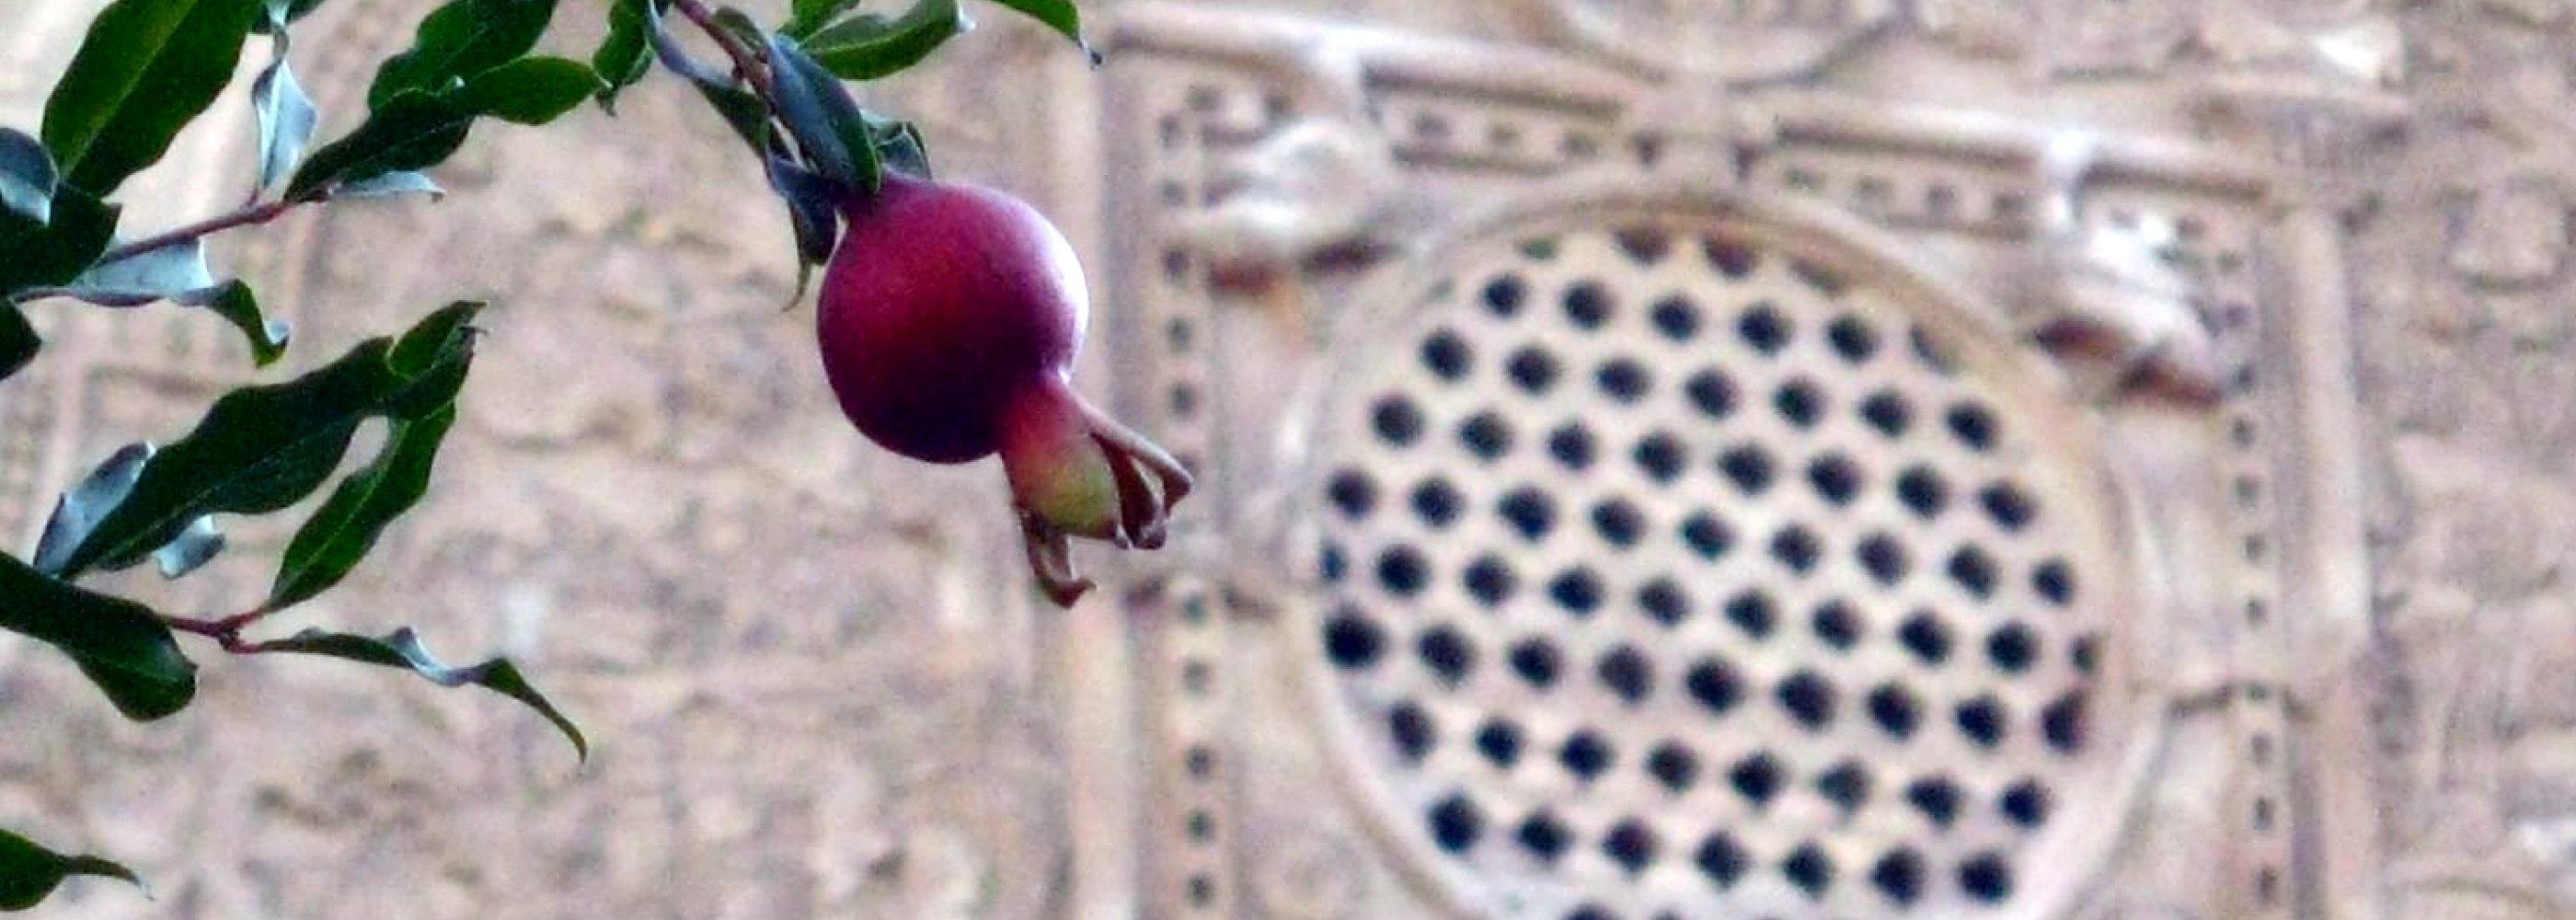 درخت انار - کاشان ایران